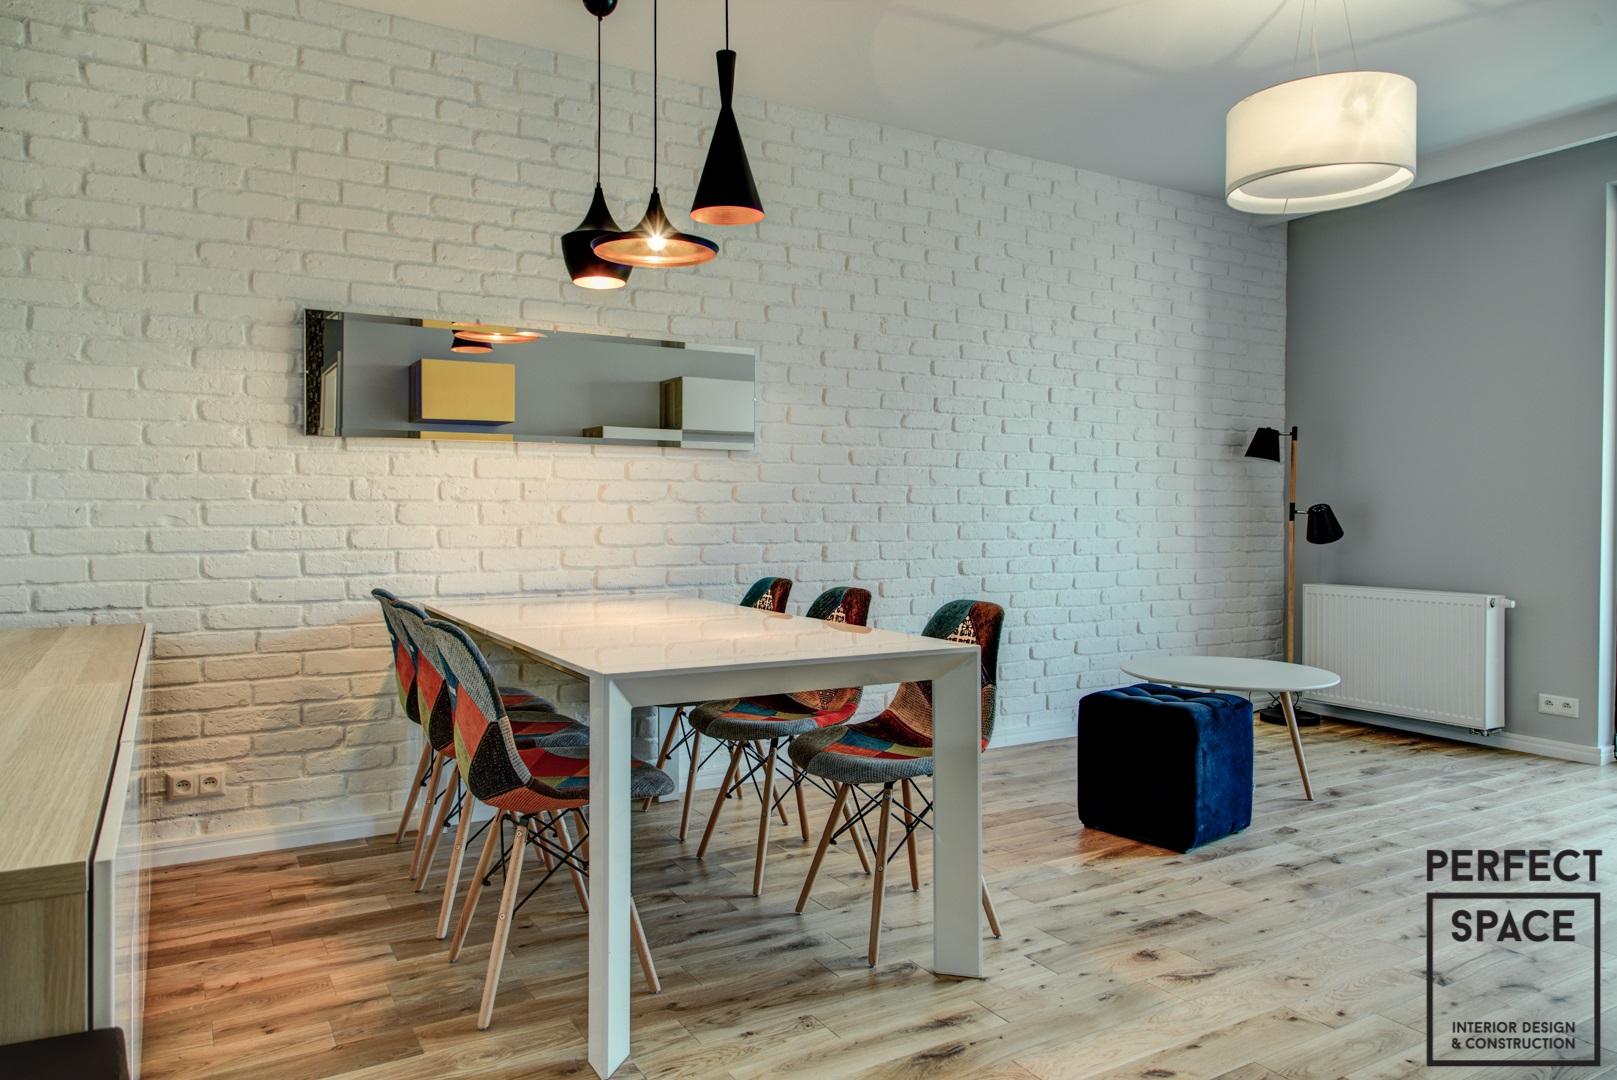 perfect space funkcjonalne wnetrze mieszkania mieszkania